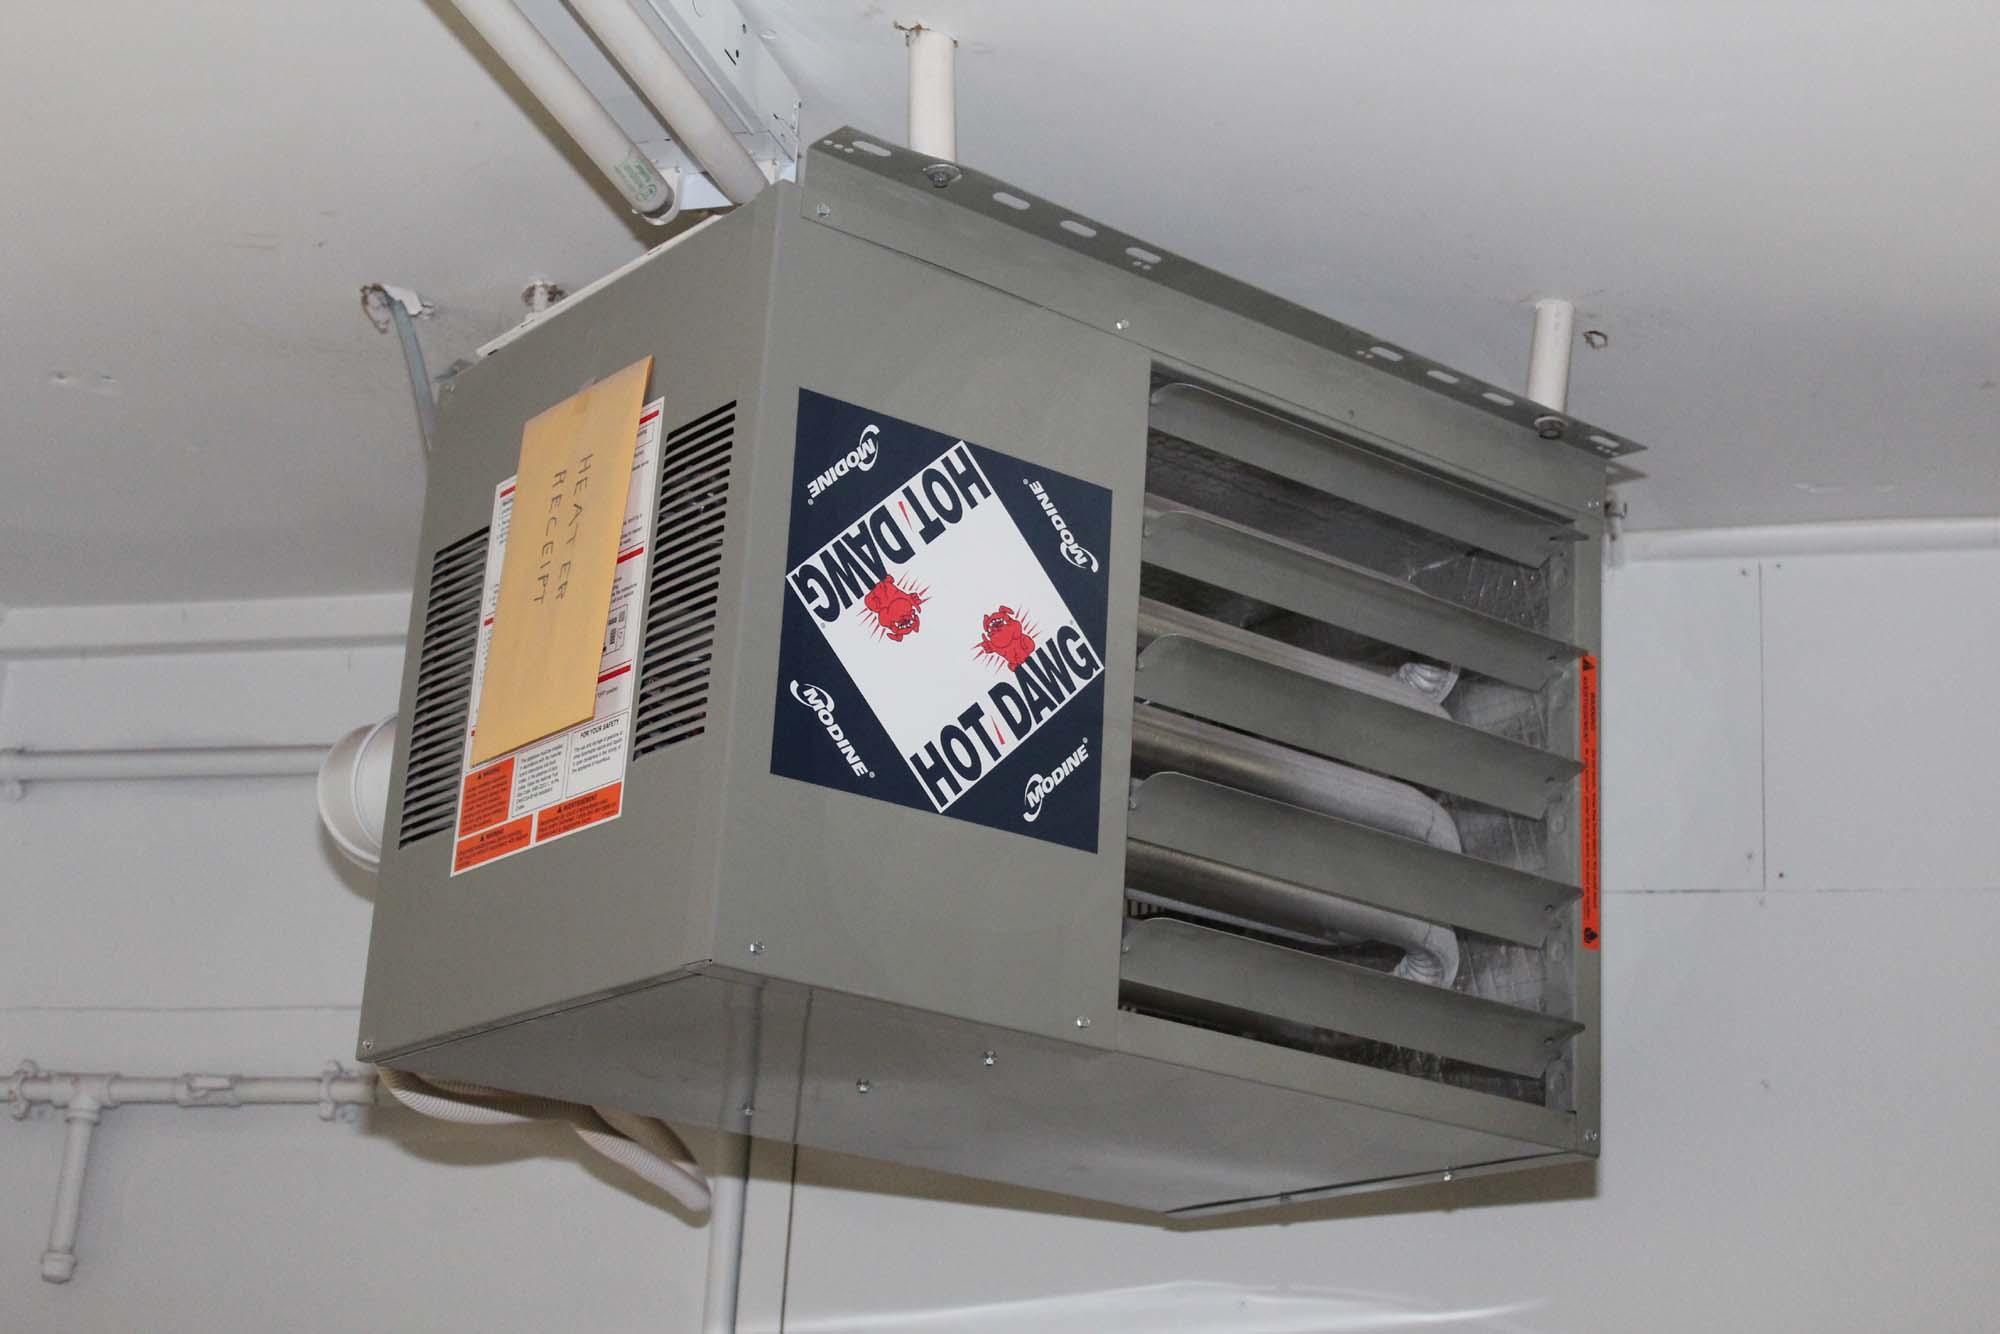 Compressed Air HVAC Insulation and Windows #81664A